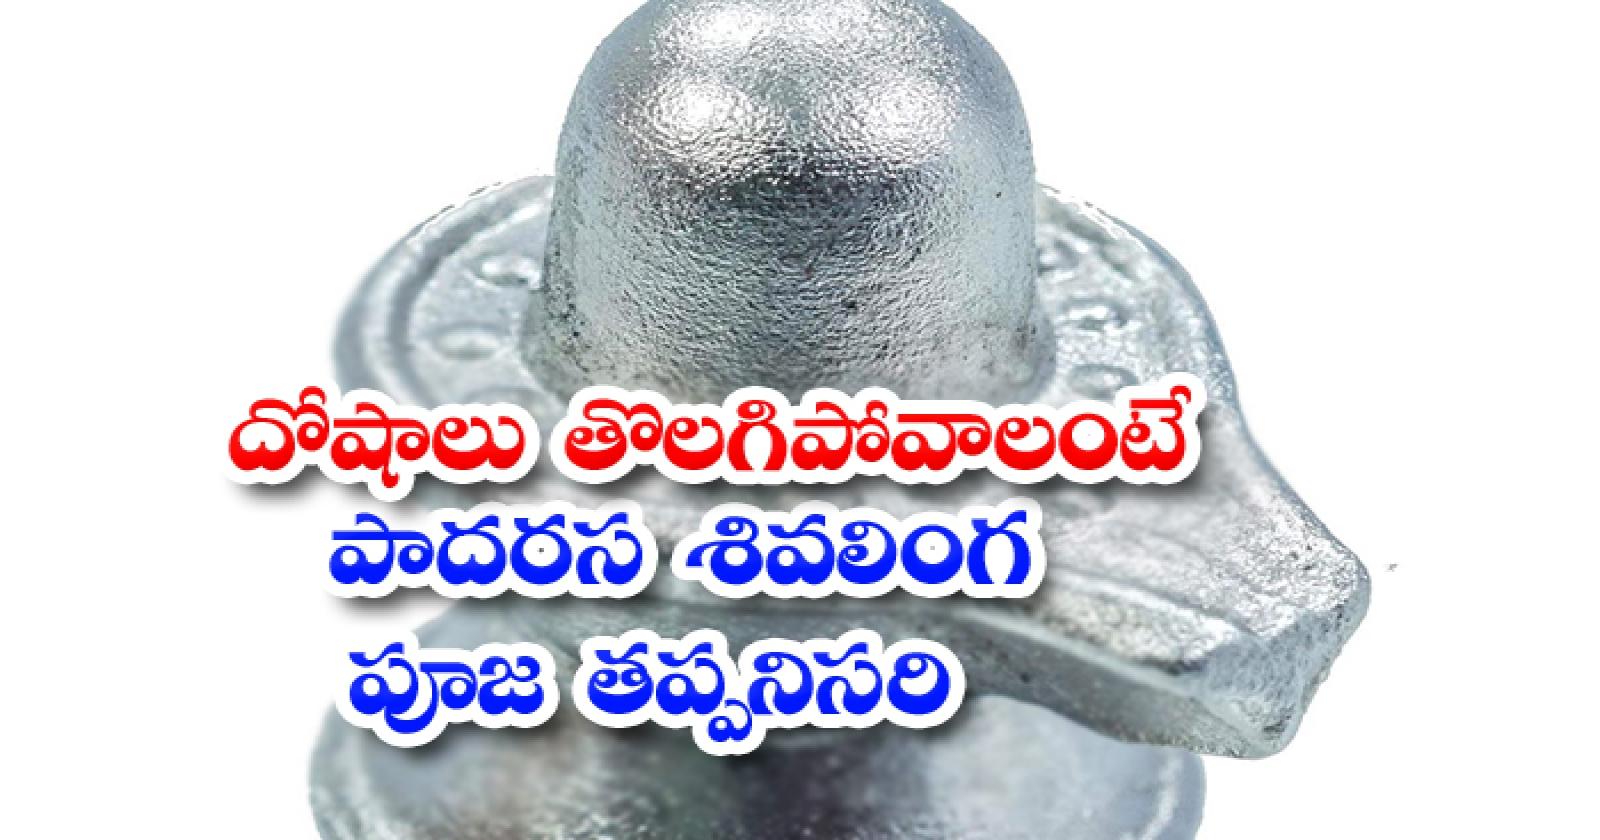 Consequences Of Worshiping Mercury Shivalinga-దోషాలు తొలగిపోవాలంటే పాదరస శివలింగం పూజ తప్పనిసరి-Latest News - Telugu-Telugu Tollywood Photo Image-TeluguStop.com